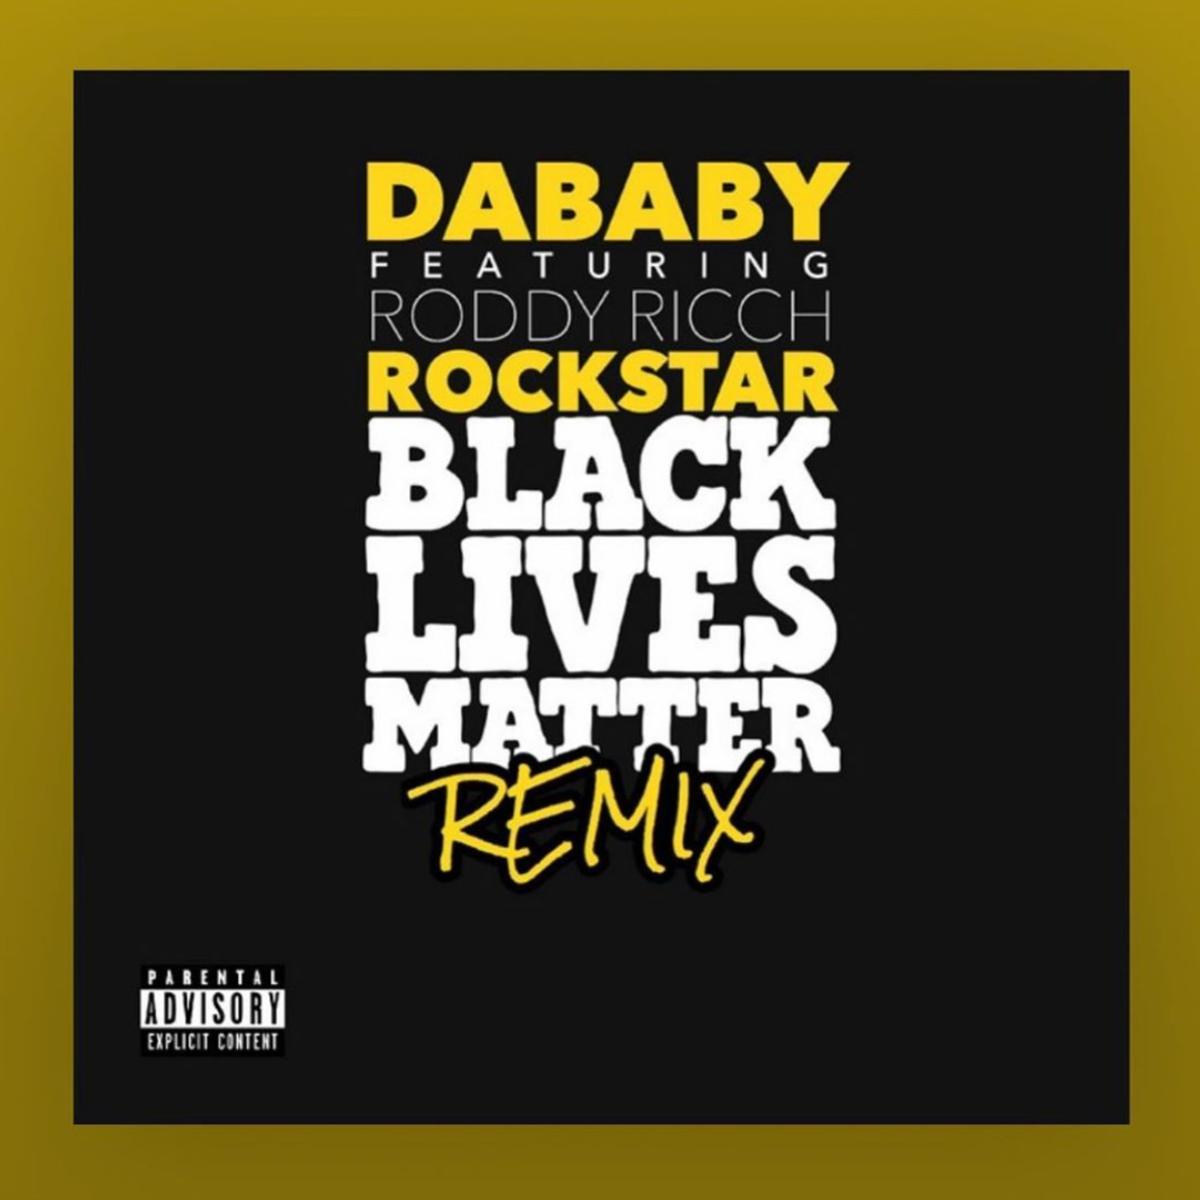 Dababy Rockstar Blm Remix Ft Roddy Ricch Audio Lyrics Download Mp3 Music Lyrics